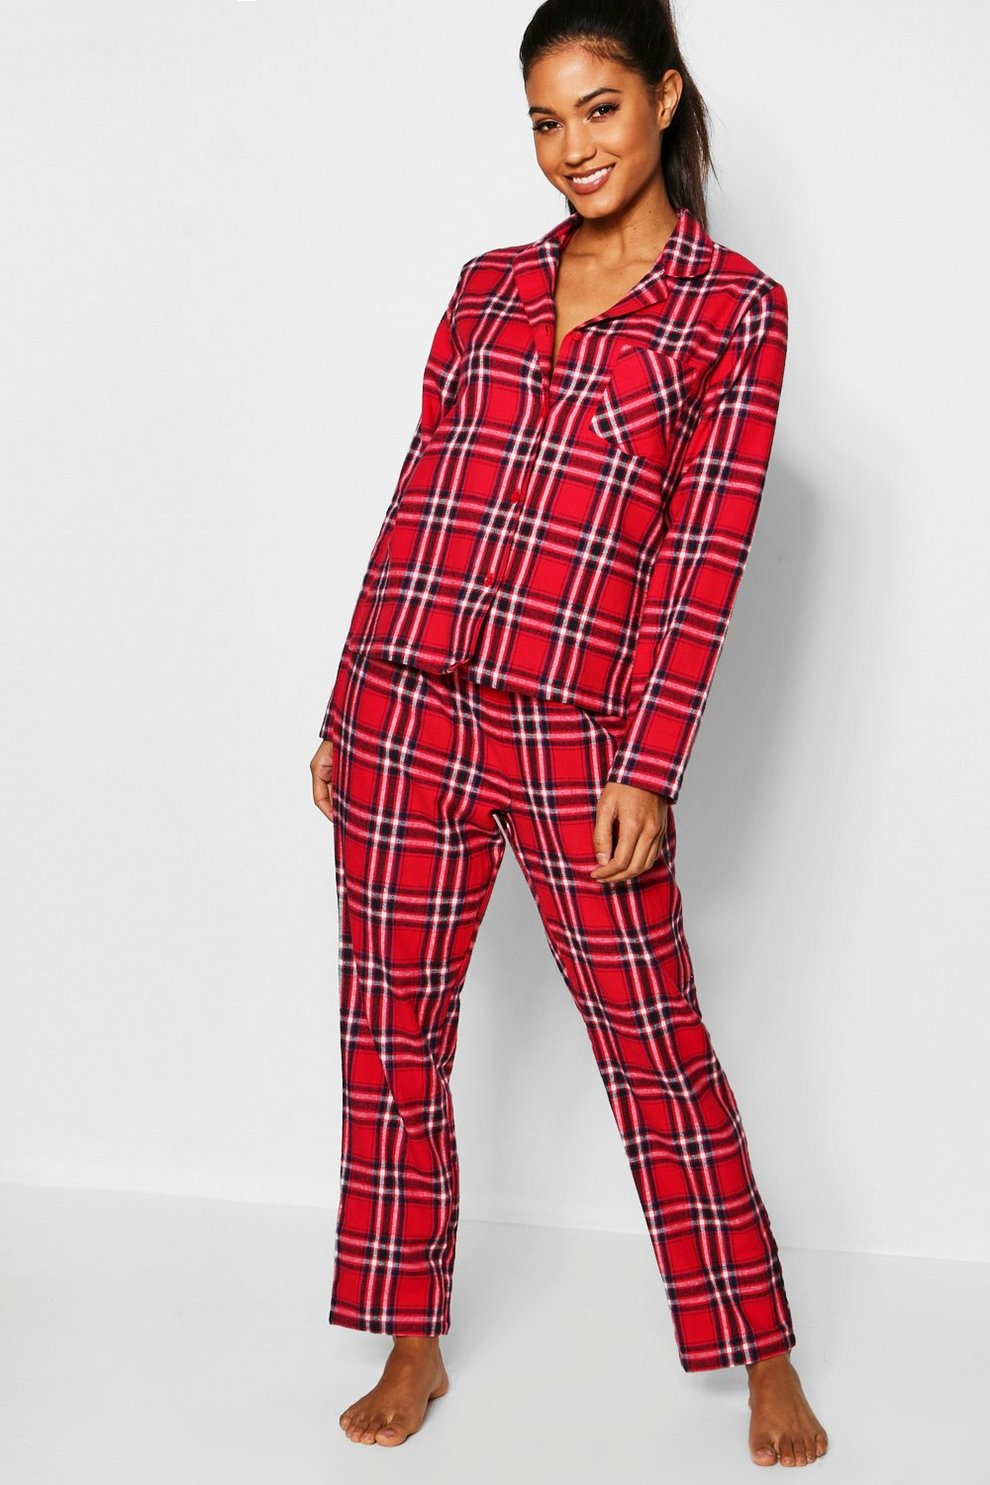 buy popular 3df16 1a170 Rot kariertes, gebürstetes Flanell Pyjama Set mit ...